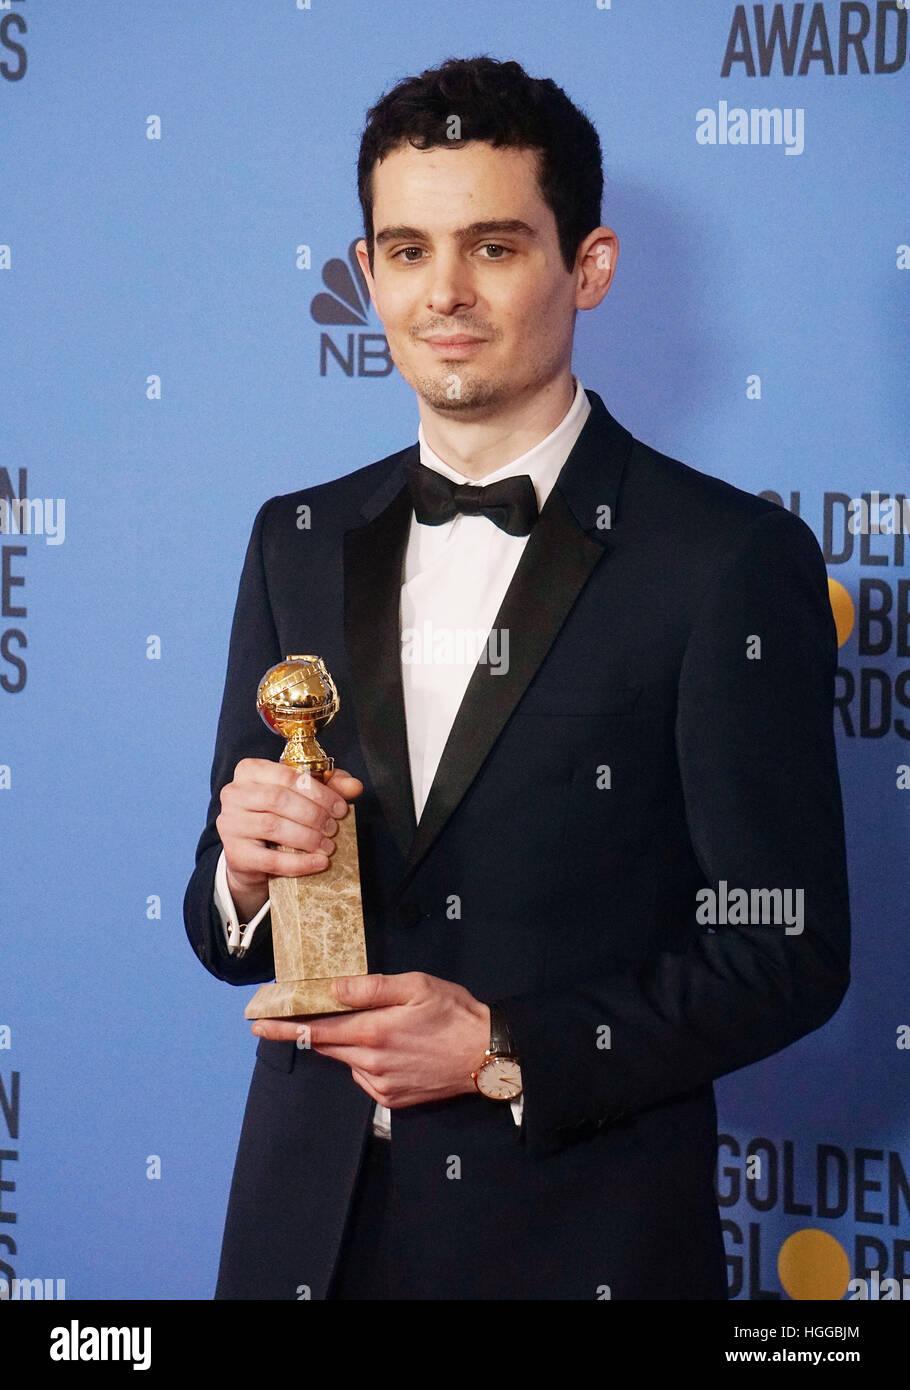 Los Angeles, USA. 8. Januar 2017. Damien Chazelle Press Room in der 74. Annual Golden Globe Awards im Beverly Hilton Stockfoto